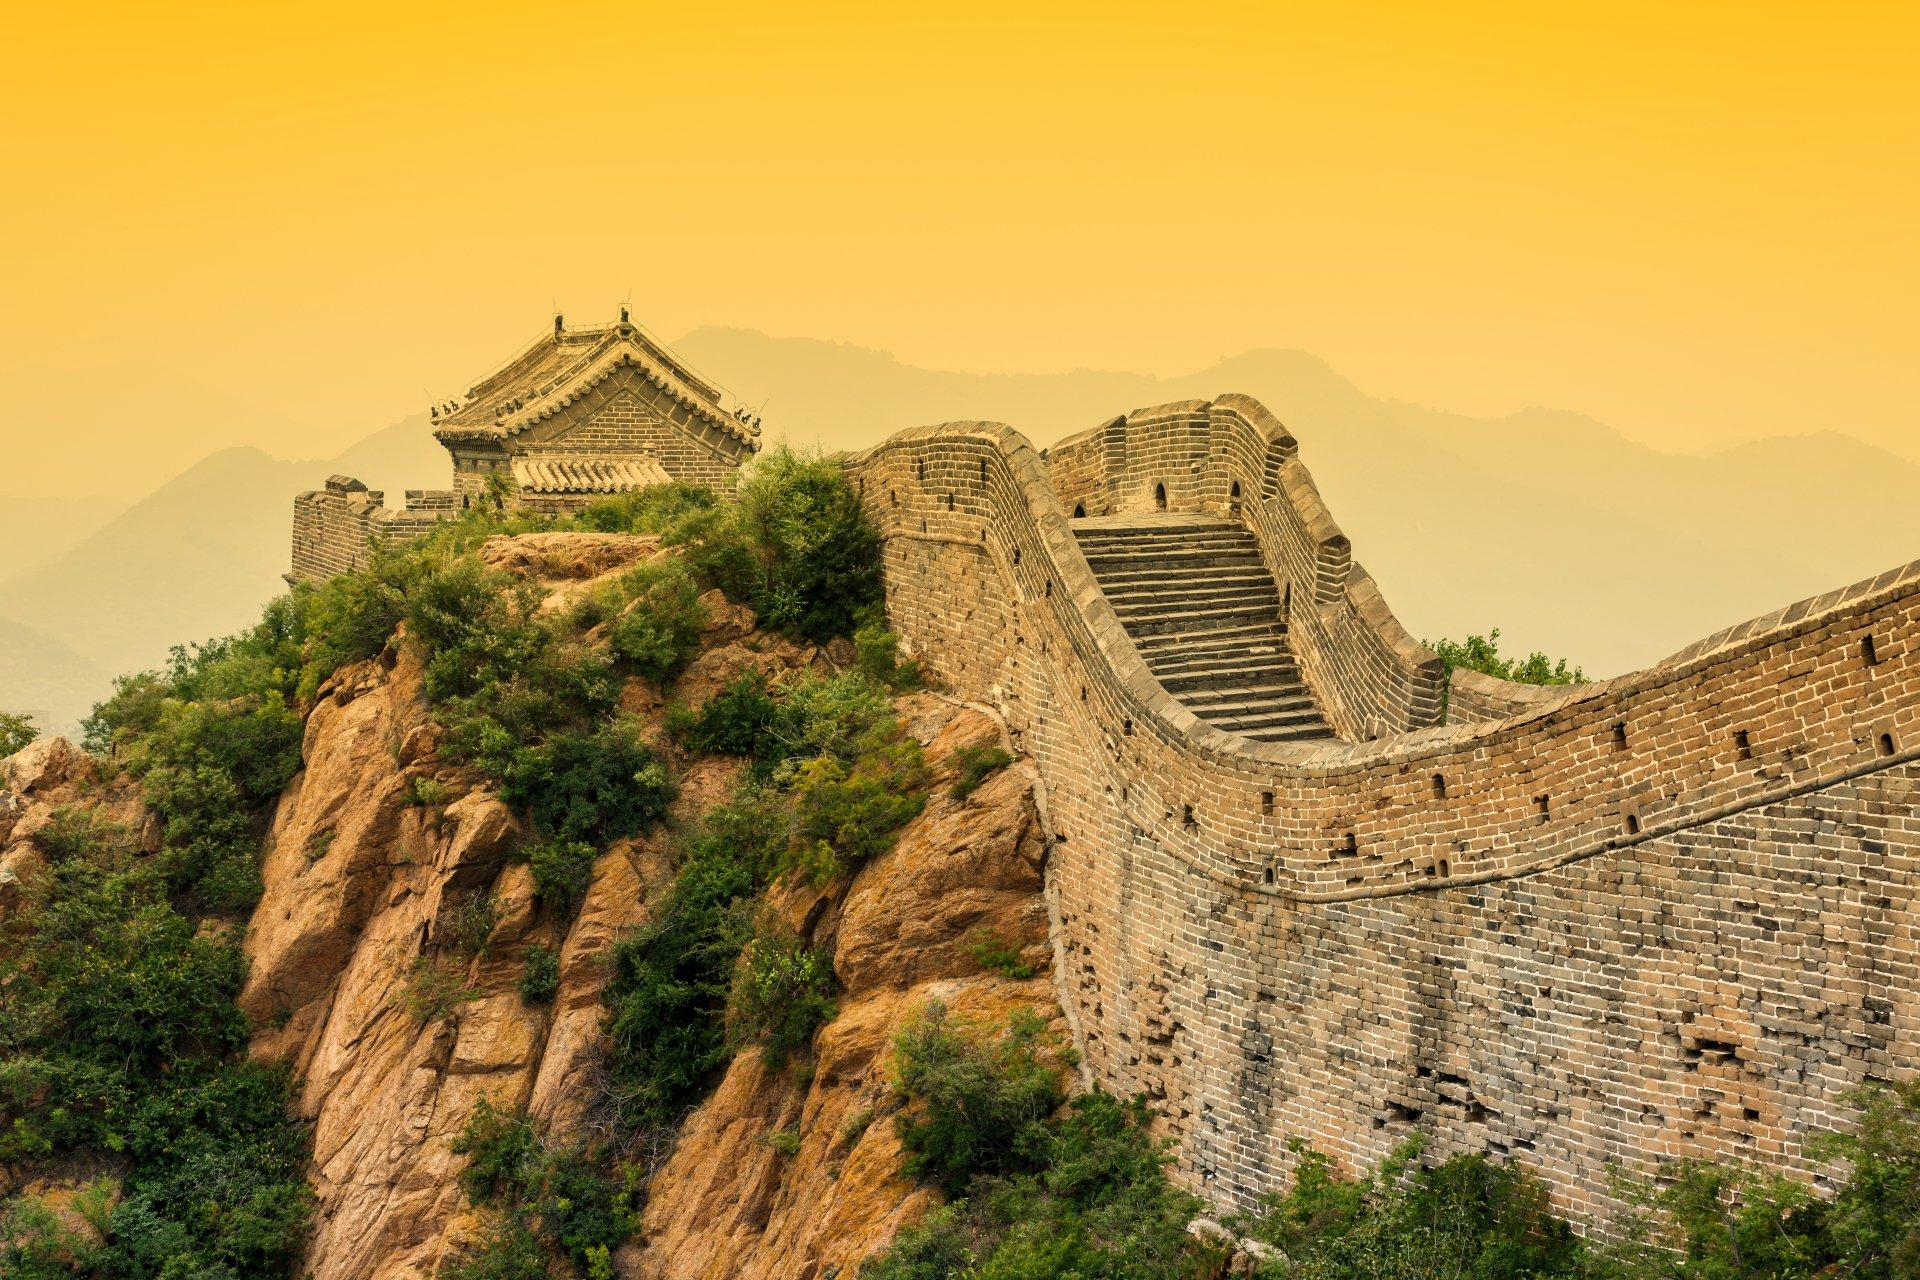 Great Wall Of China 5k Retina Ultra Hd Wallpaper